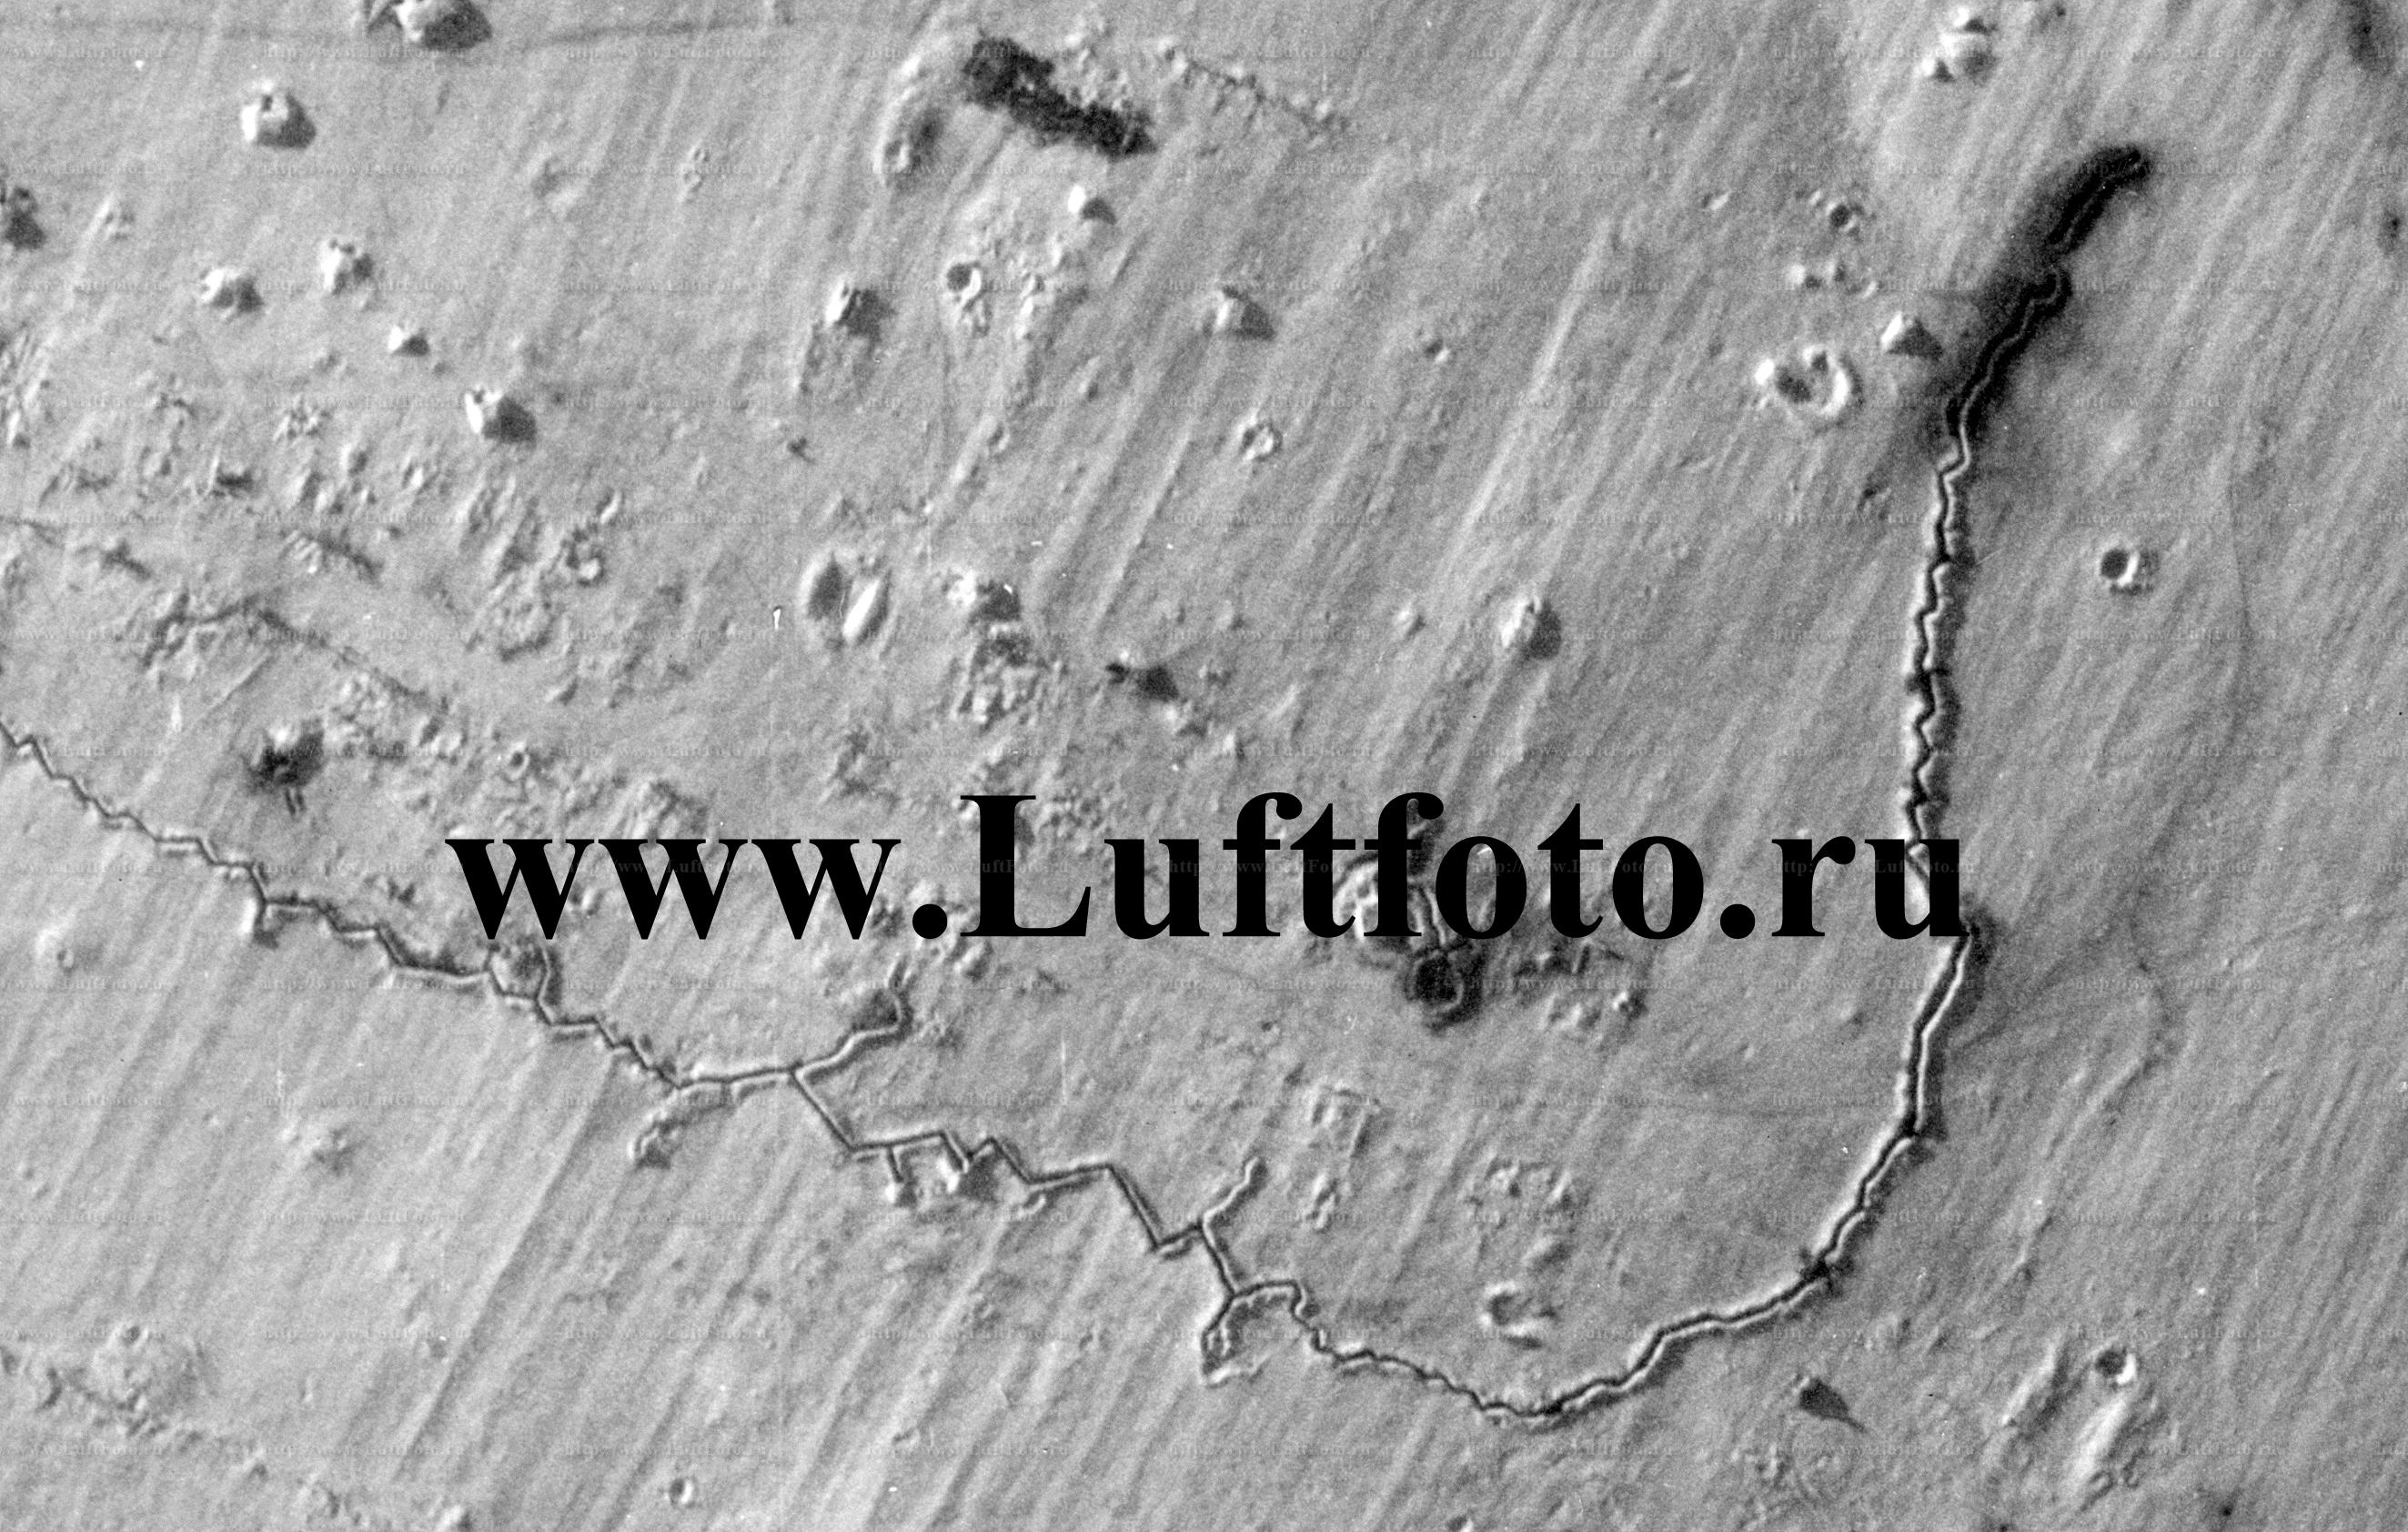 Аэрофотосъемка Люфтваффе: http://www.luftfoto.ru/primeri_scanov.html